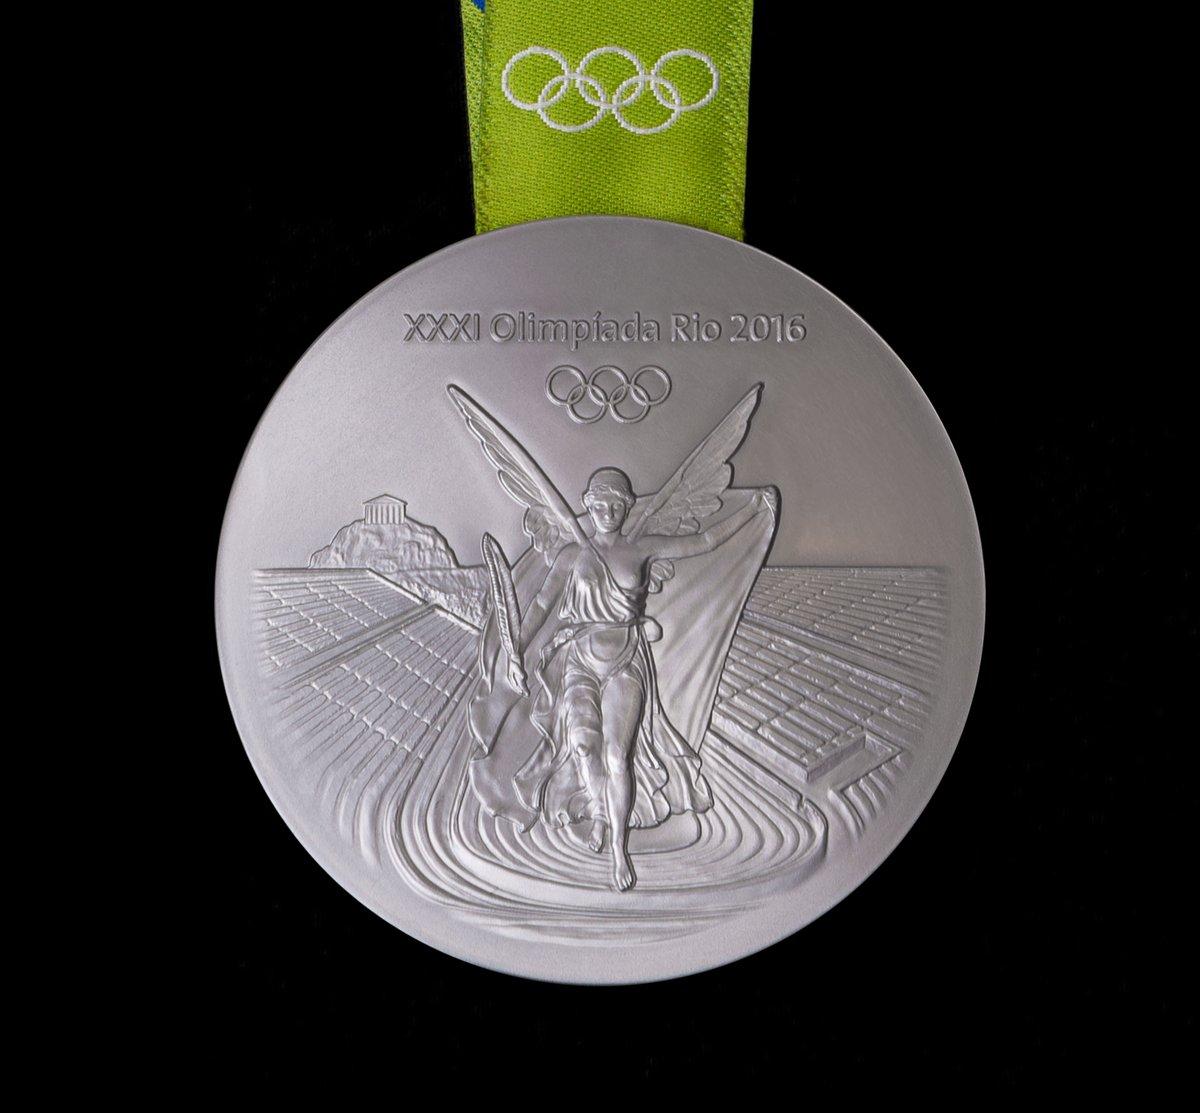 medallas-olimpicas-plata-rio-de-janeiro-2016